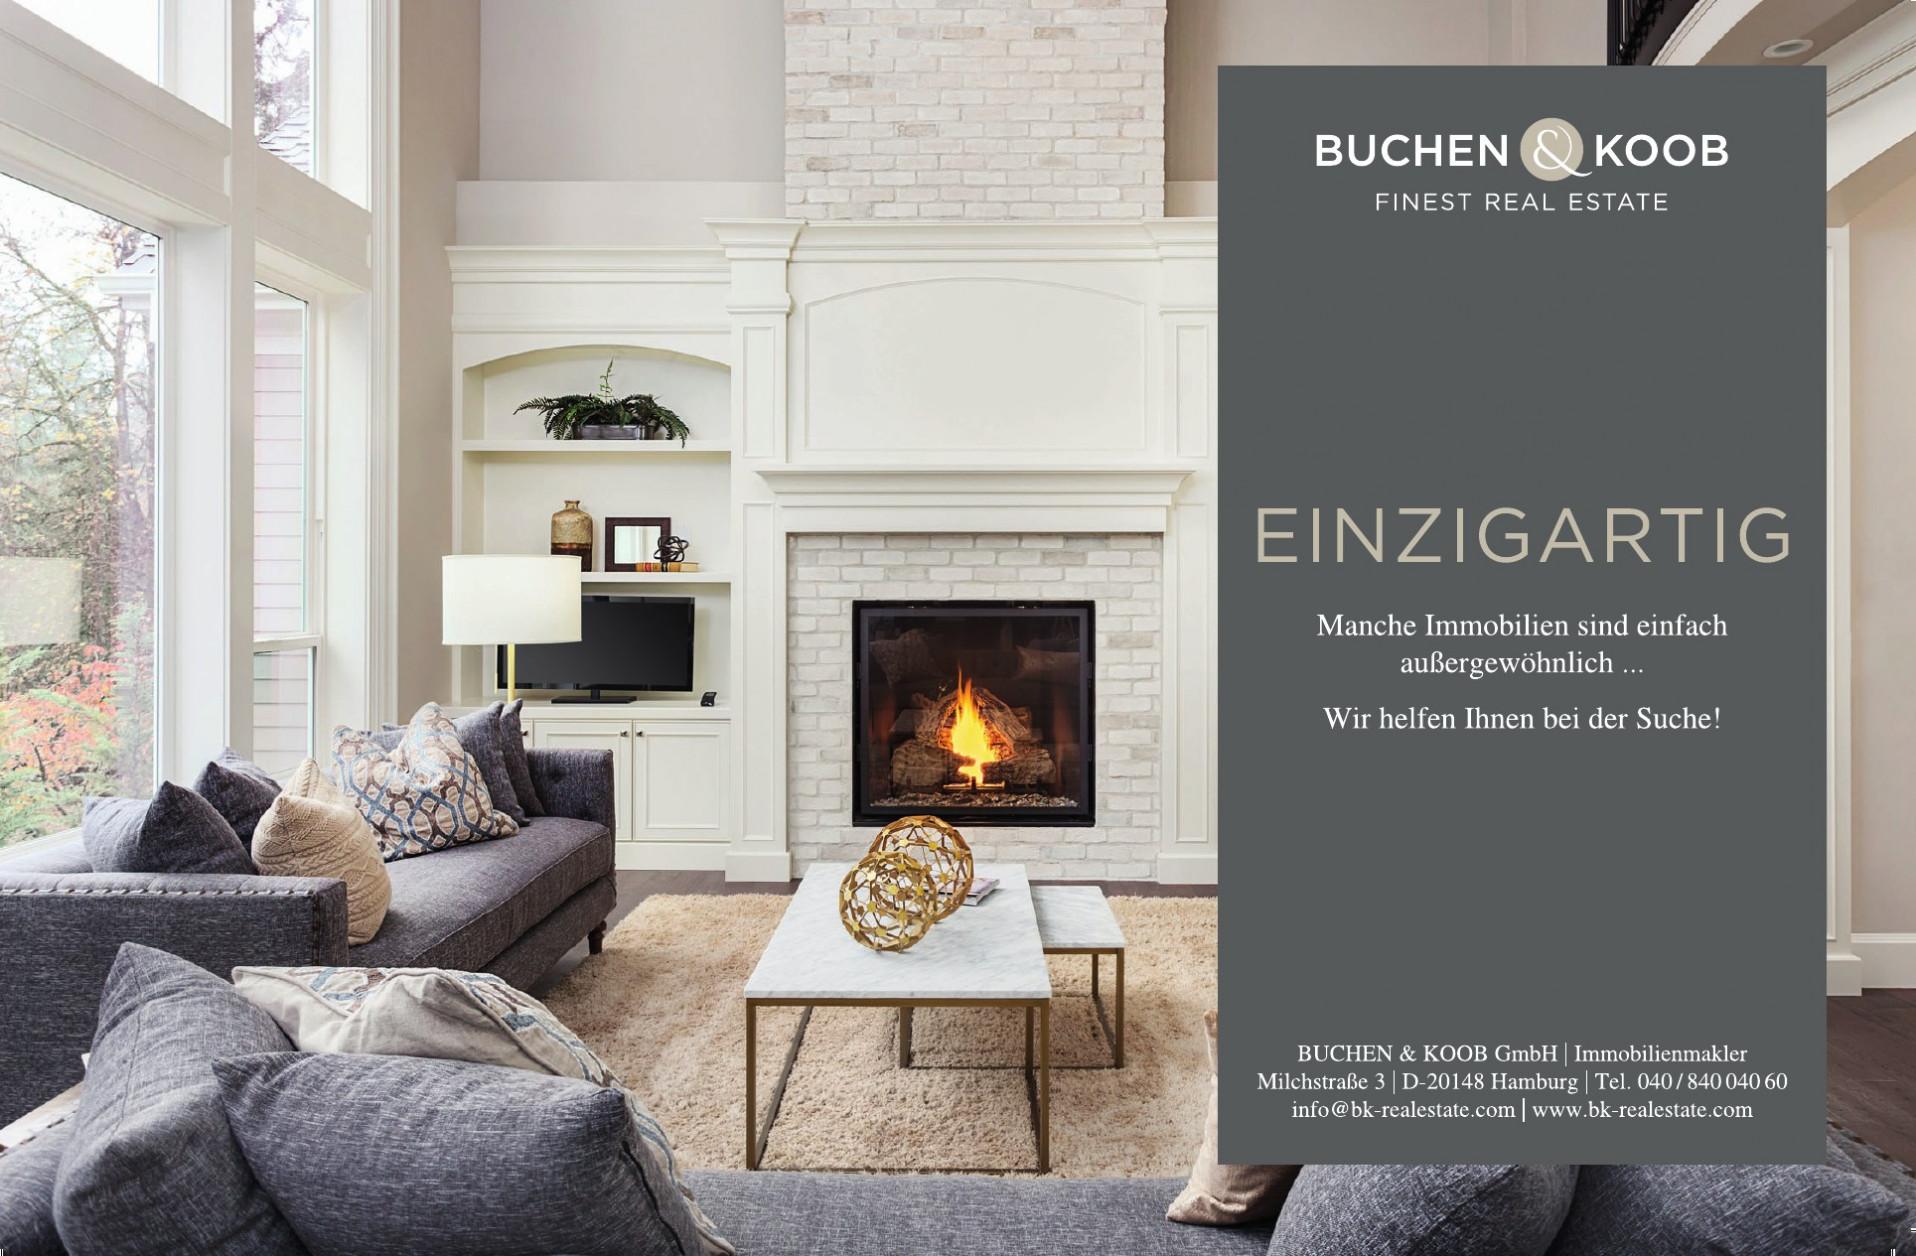 BUCHEN & KOOB GmbH